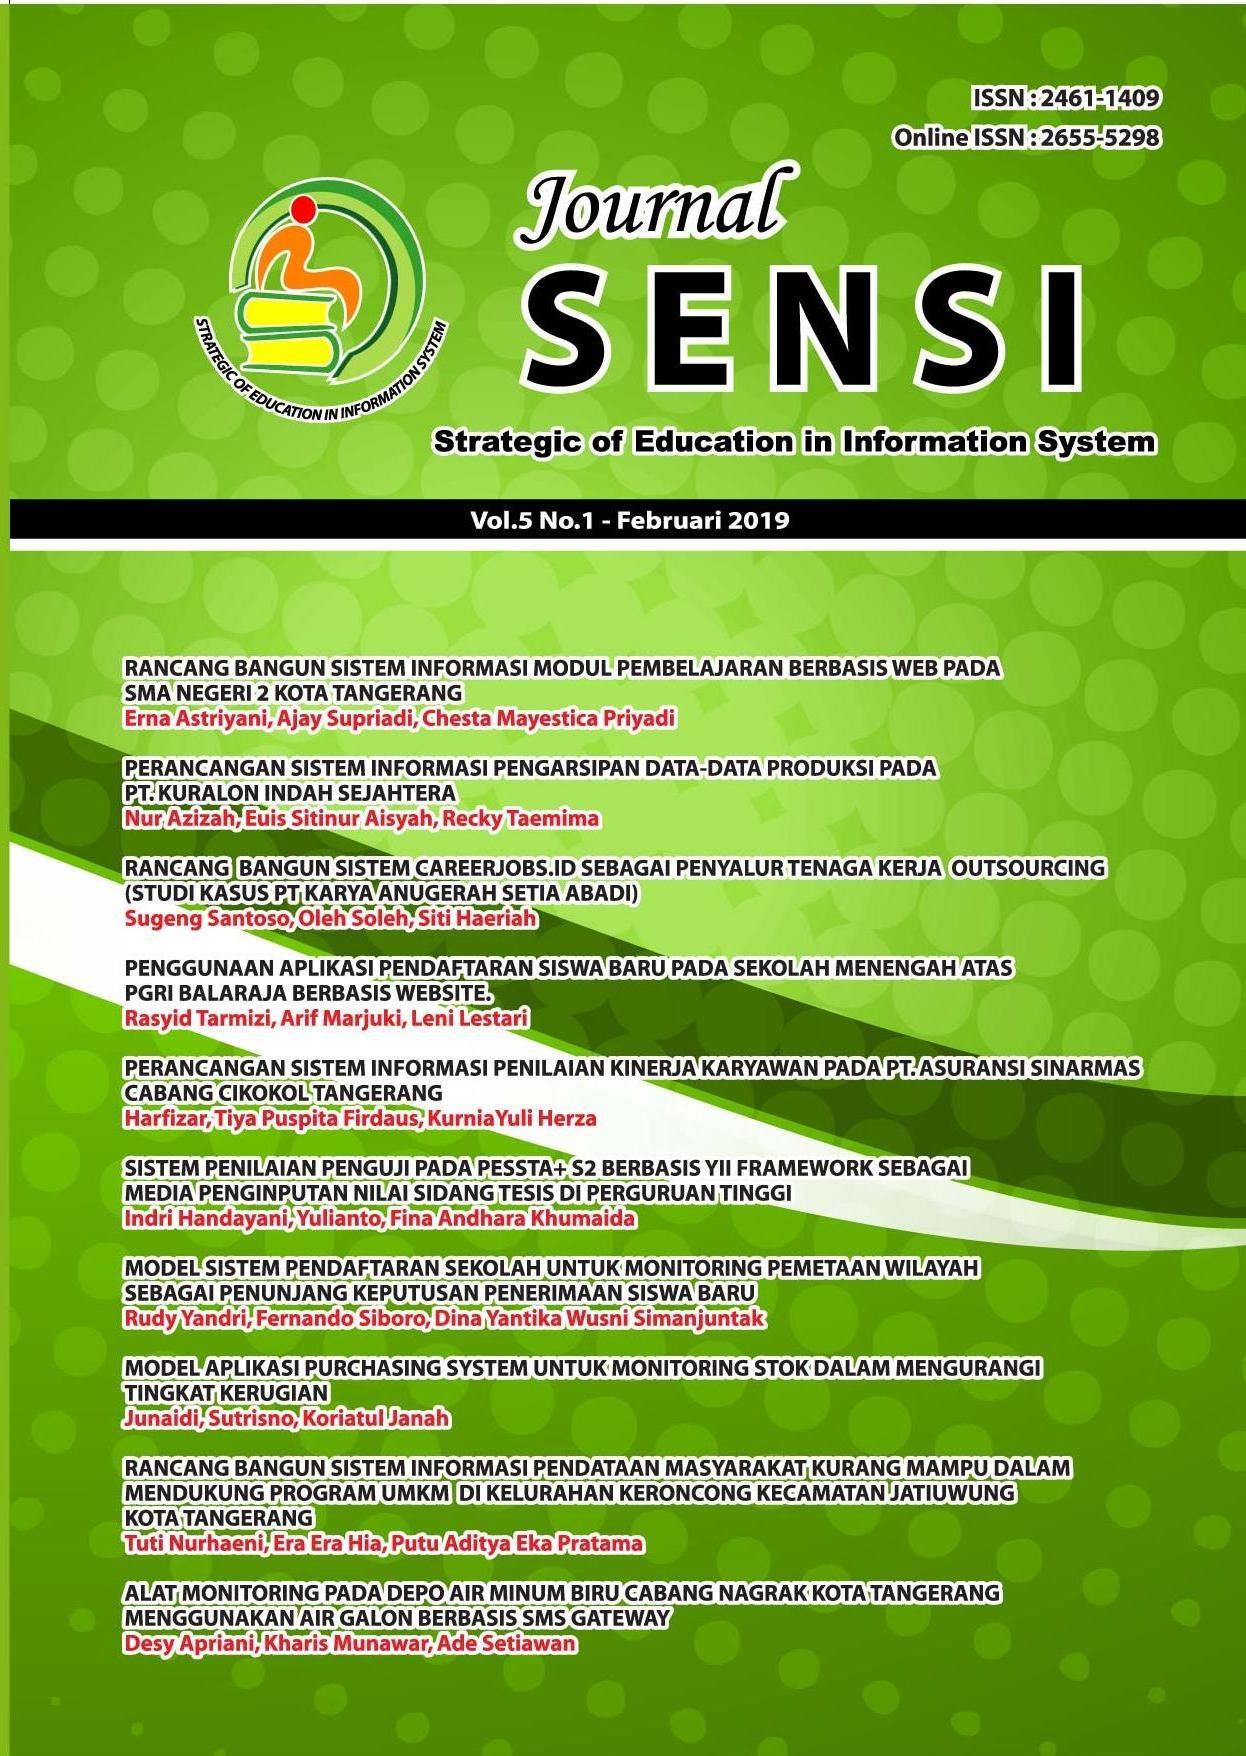 SENSI JOURNAL VOL.5 NO.1 Februari 2019